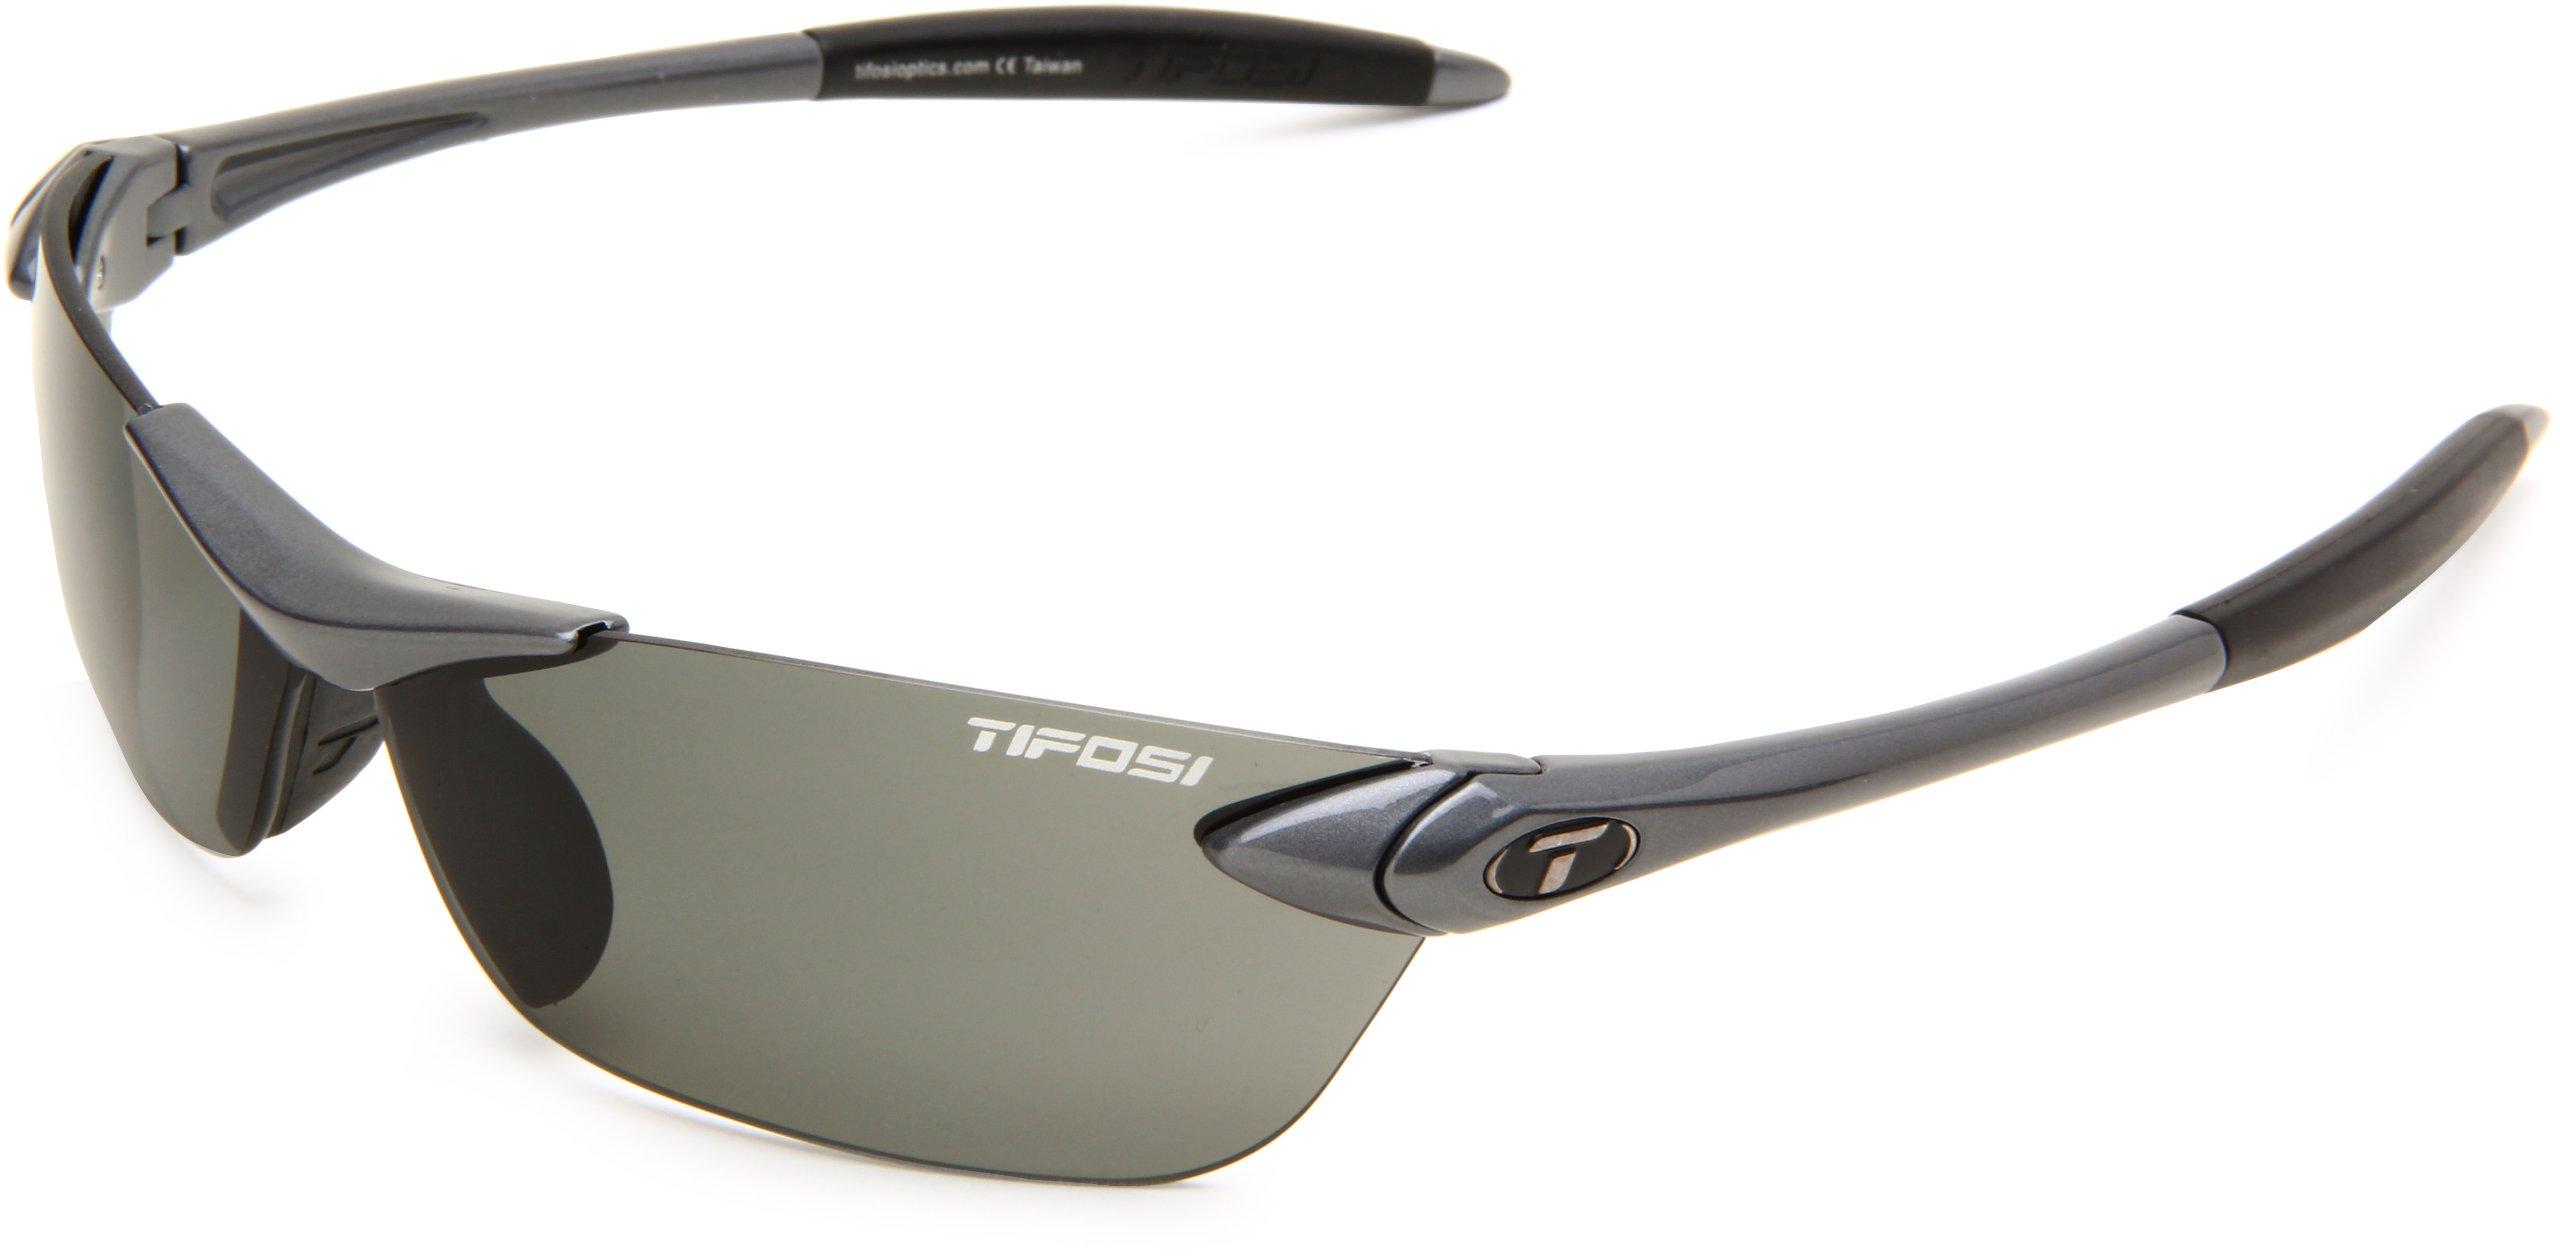 Tifosi Seek 0180500351 Polarized Wrap Sunglasses,Gunmetal Frame/Smoke Lens,One Size